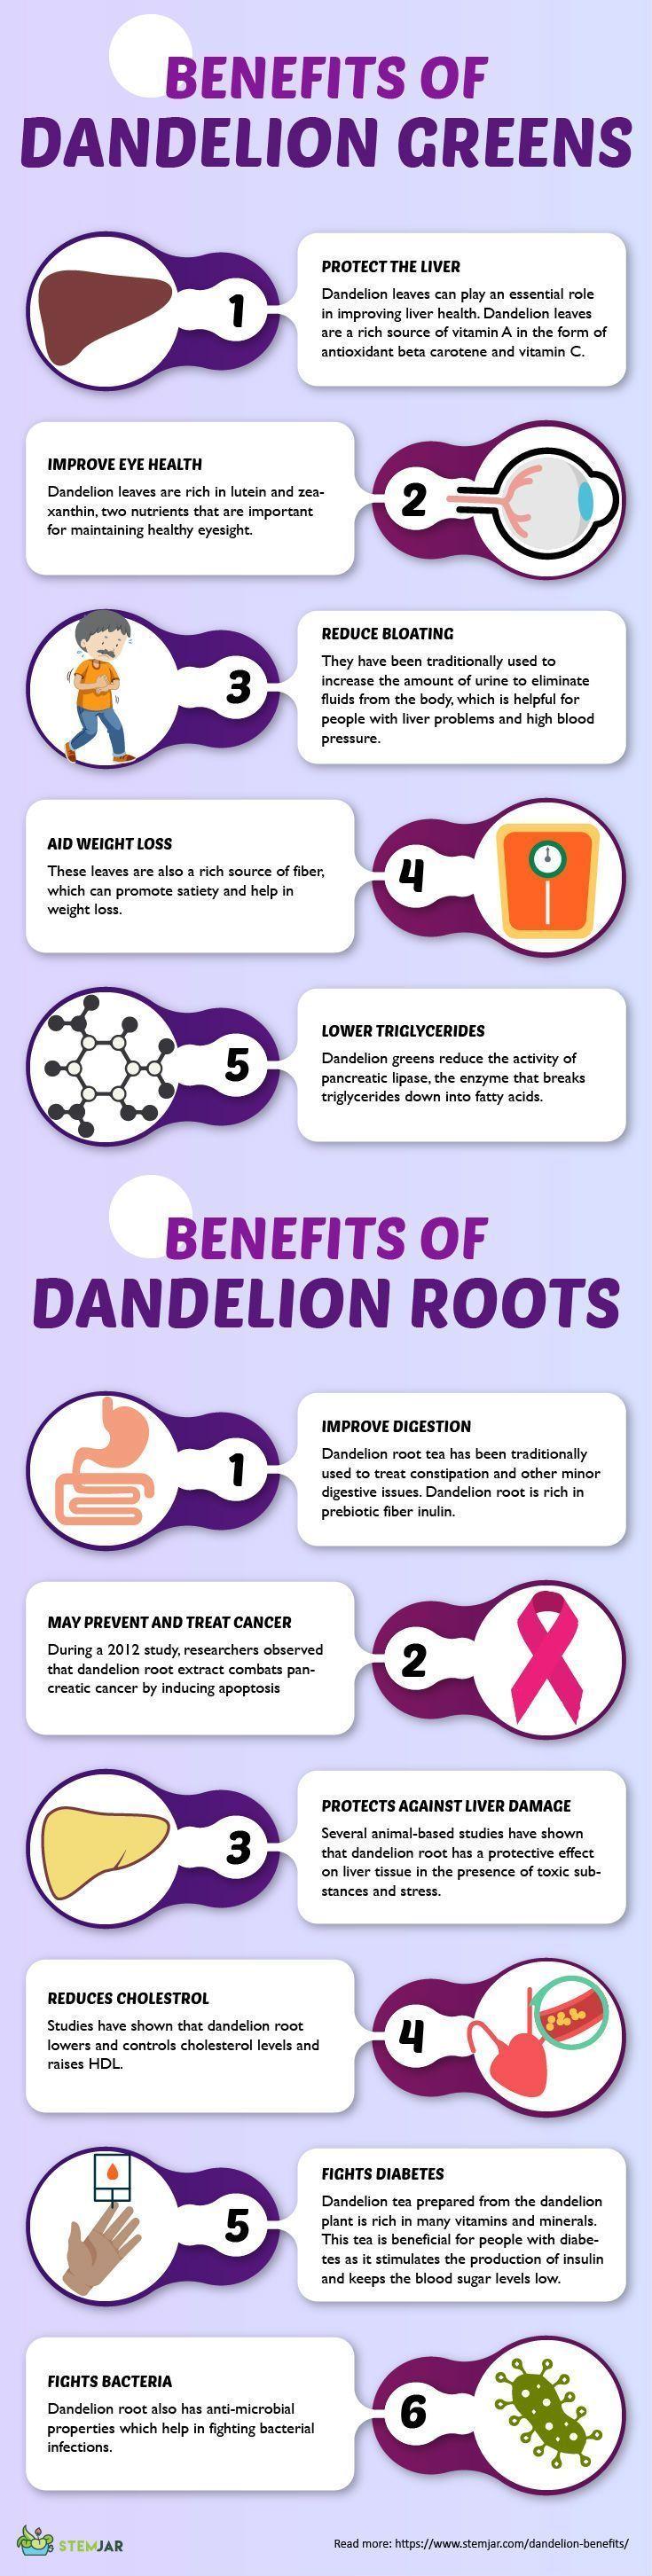 Dandelion - A Pesky Weed or Excellent Food and Medicine? #eggnutritionfacts Dandelion – A Pesky Weed or Excellent Food and Medicine?  #Dandelion #Nutrition #Tips #Wellness #Health #Stemjar #infographics #eggnutritionfacts Dandelion - A Pesky Weed or Excellent Food and Medicine? #eggnutritionfacts Dandelion – A Pesky Weed or Excellent Food and Medicine?  #Dandelion #Nutrition #Tips #Wellness #Health #Stemjar #infographics #eggnutritionfacts